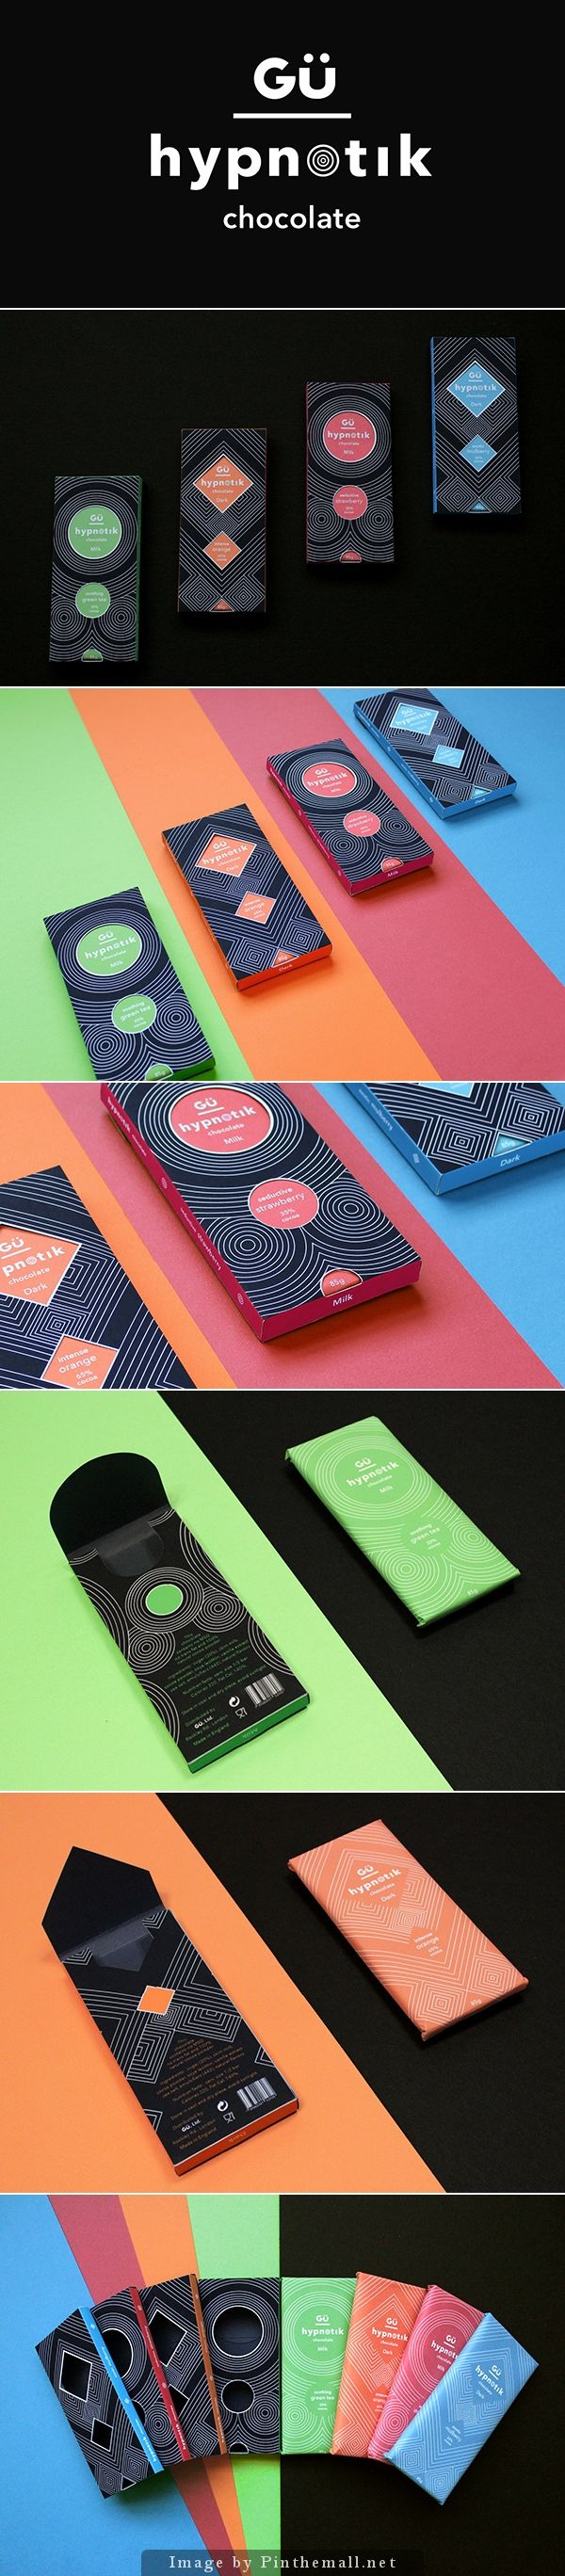 Hipnotik Chocolate by Huan Nguyen